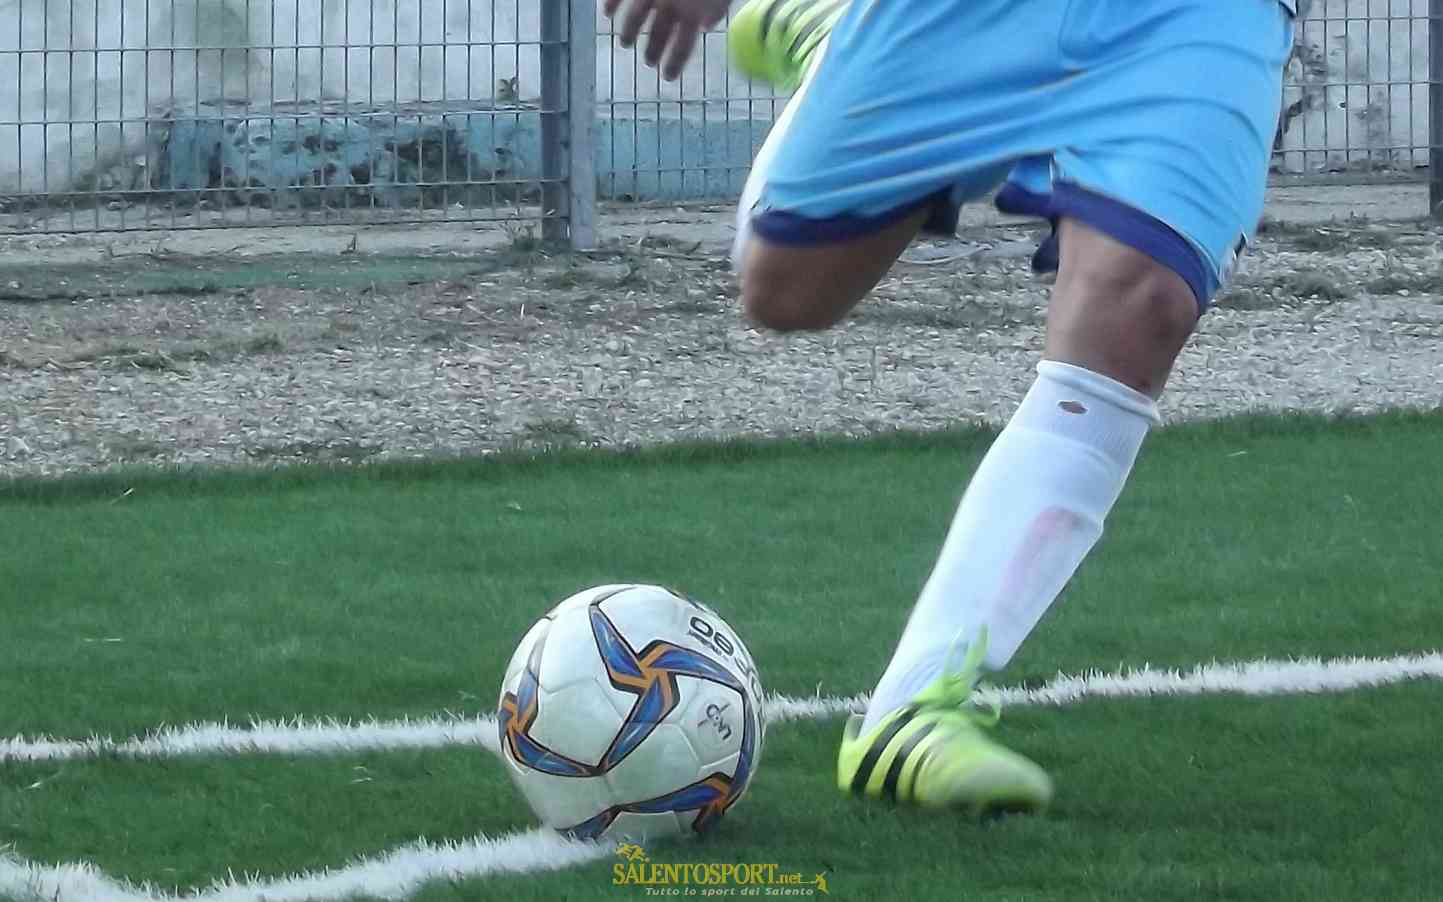 pallone-generica-eccellenza-promozione-serie-d ss palama